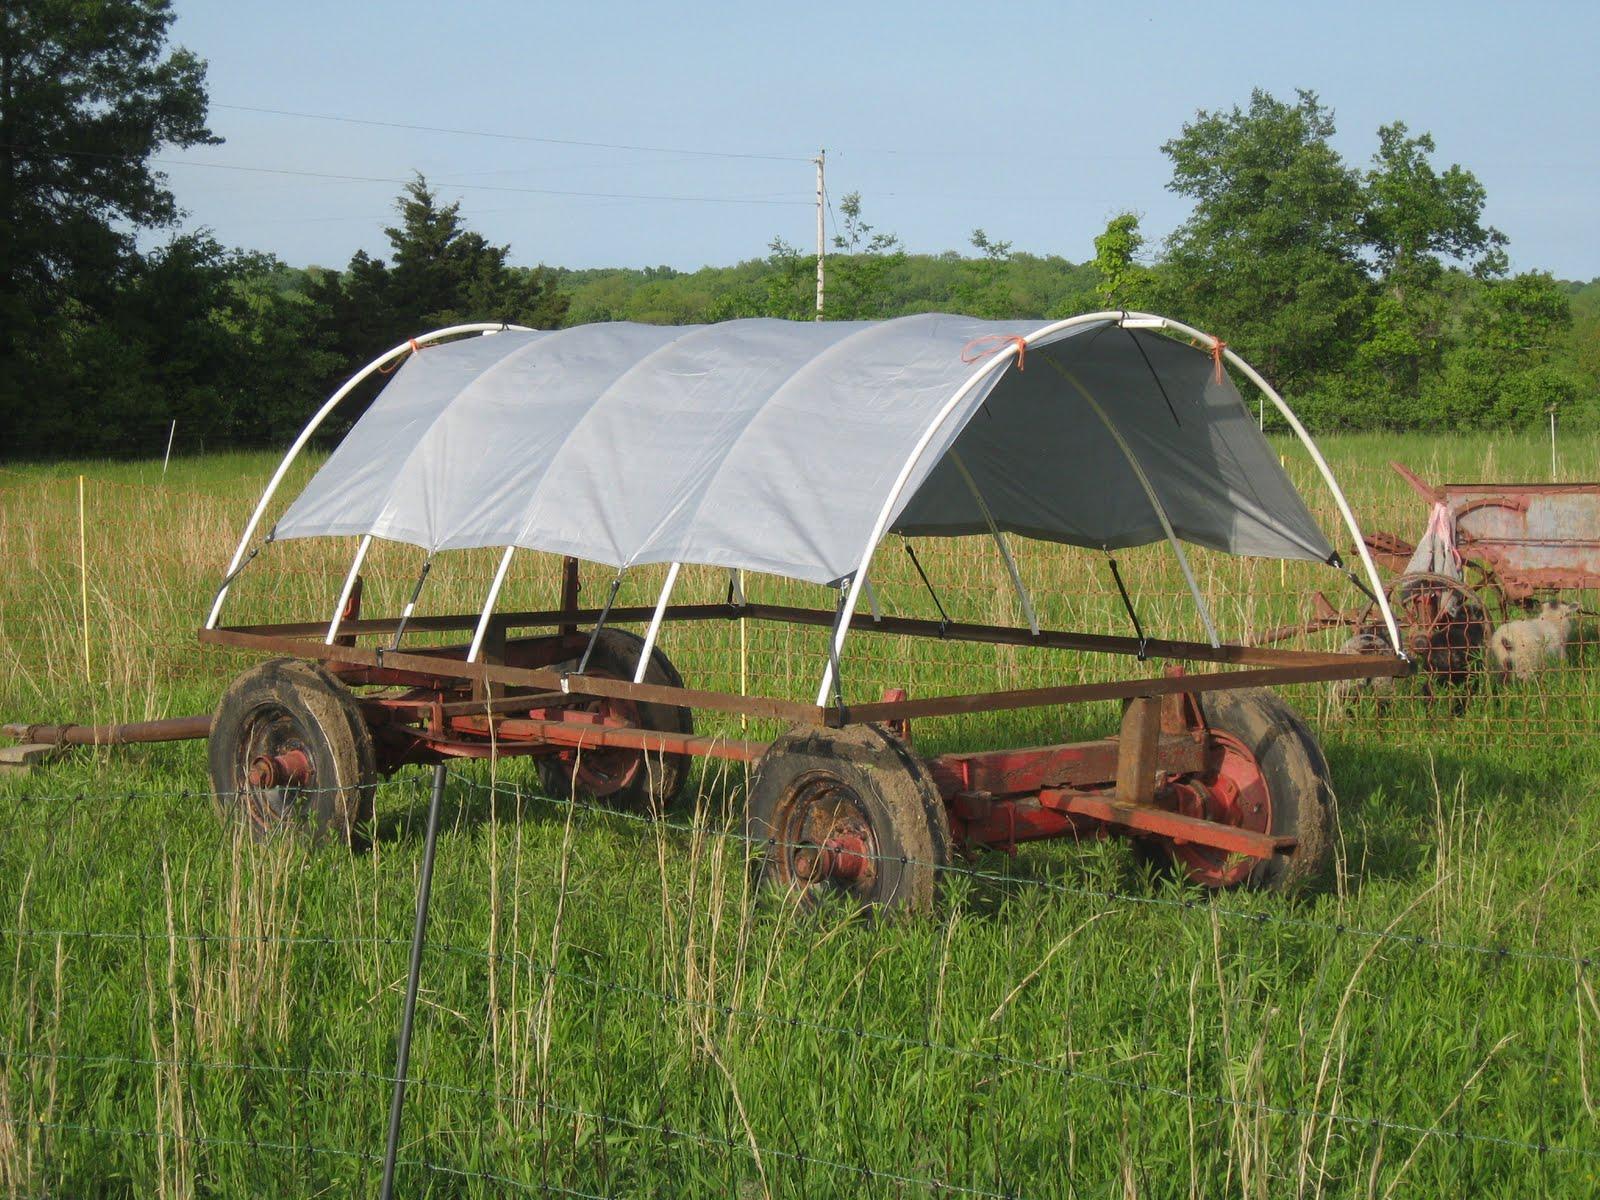 Kansas Fiber Farm Shade Shelters